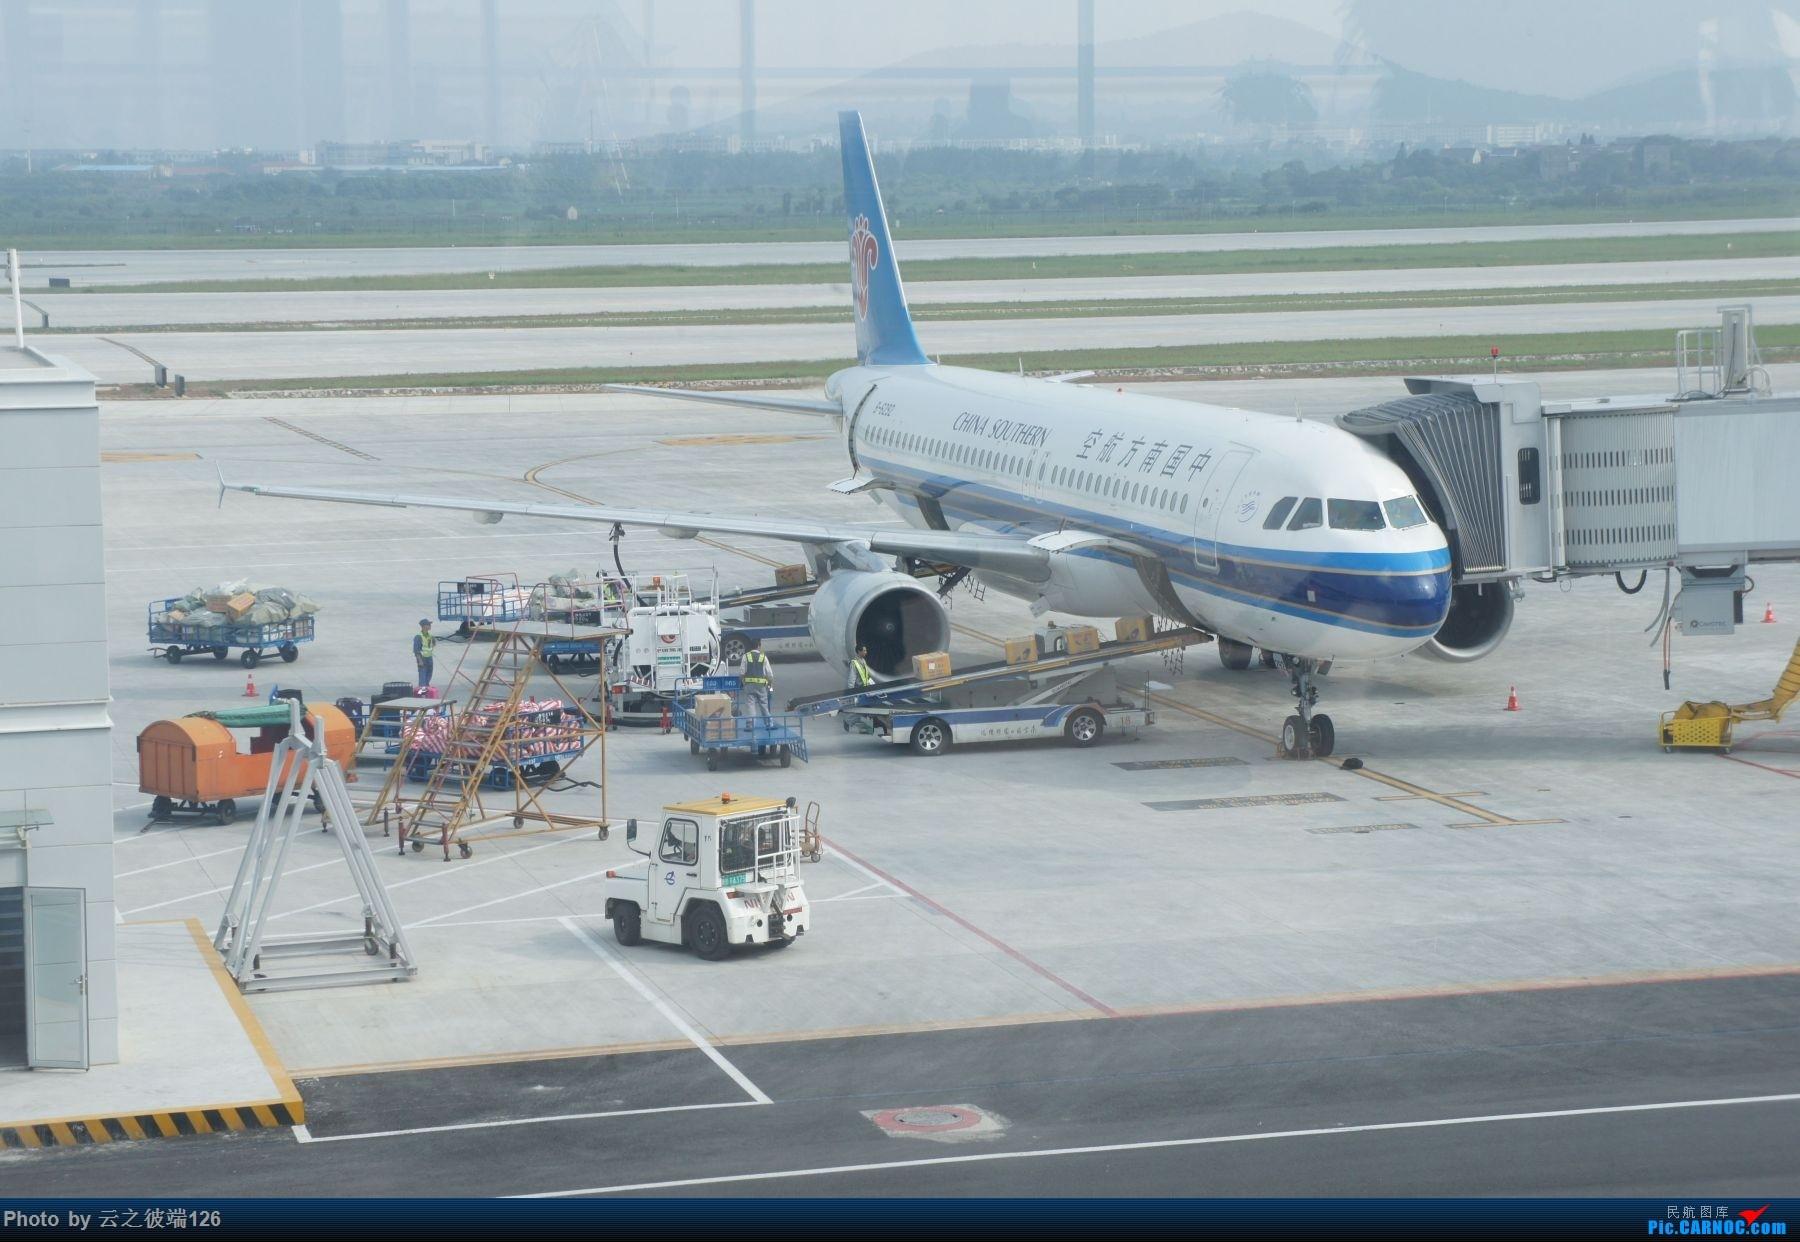 Re:[原创]迟到两年的游记 -----------NKG-SZX-NKG ZH+白菜航------ AIRBUS A320-200 B-6292 中国南京禄口国际机场